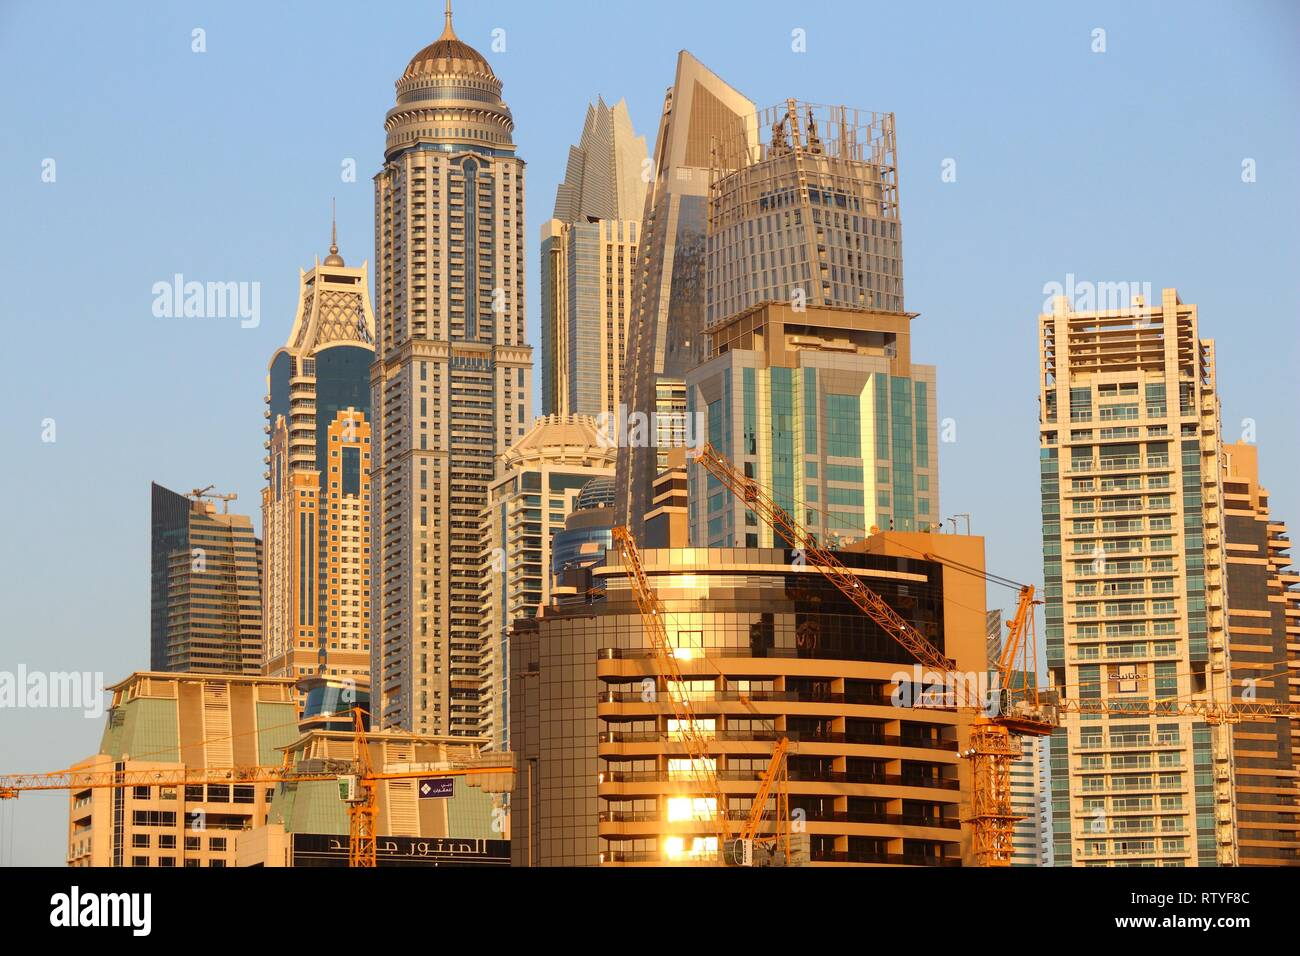 DUBAI, UAE - NOVEMBER 23, 2017: Sunset light skyline of Dubai Marina district, United Arab Emirates. Dubai is the most populous city in UAE and a majo - Stock Image